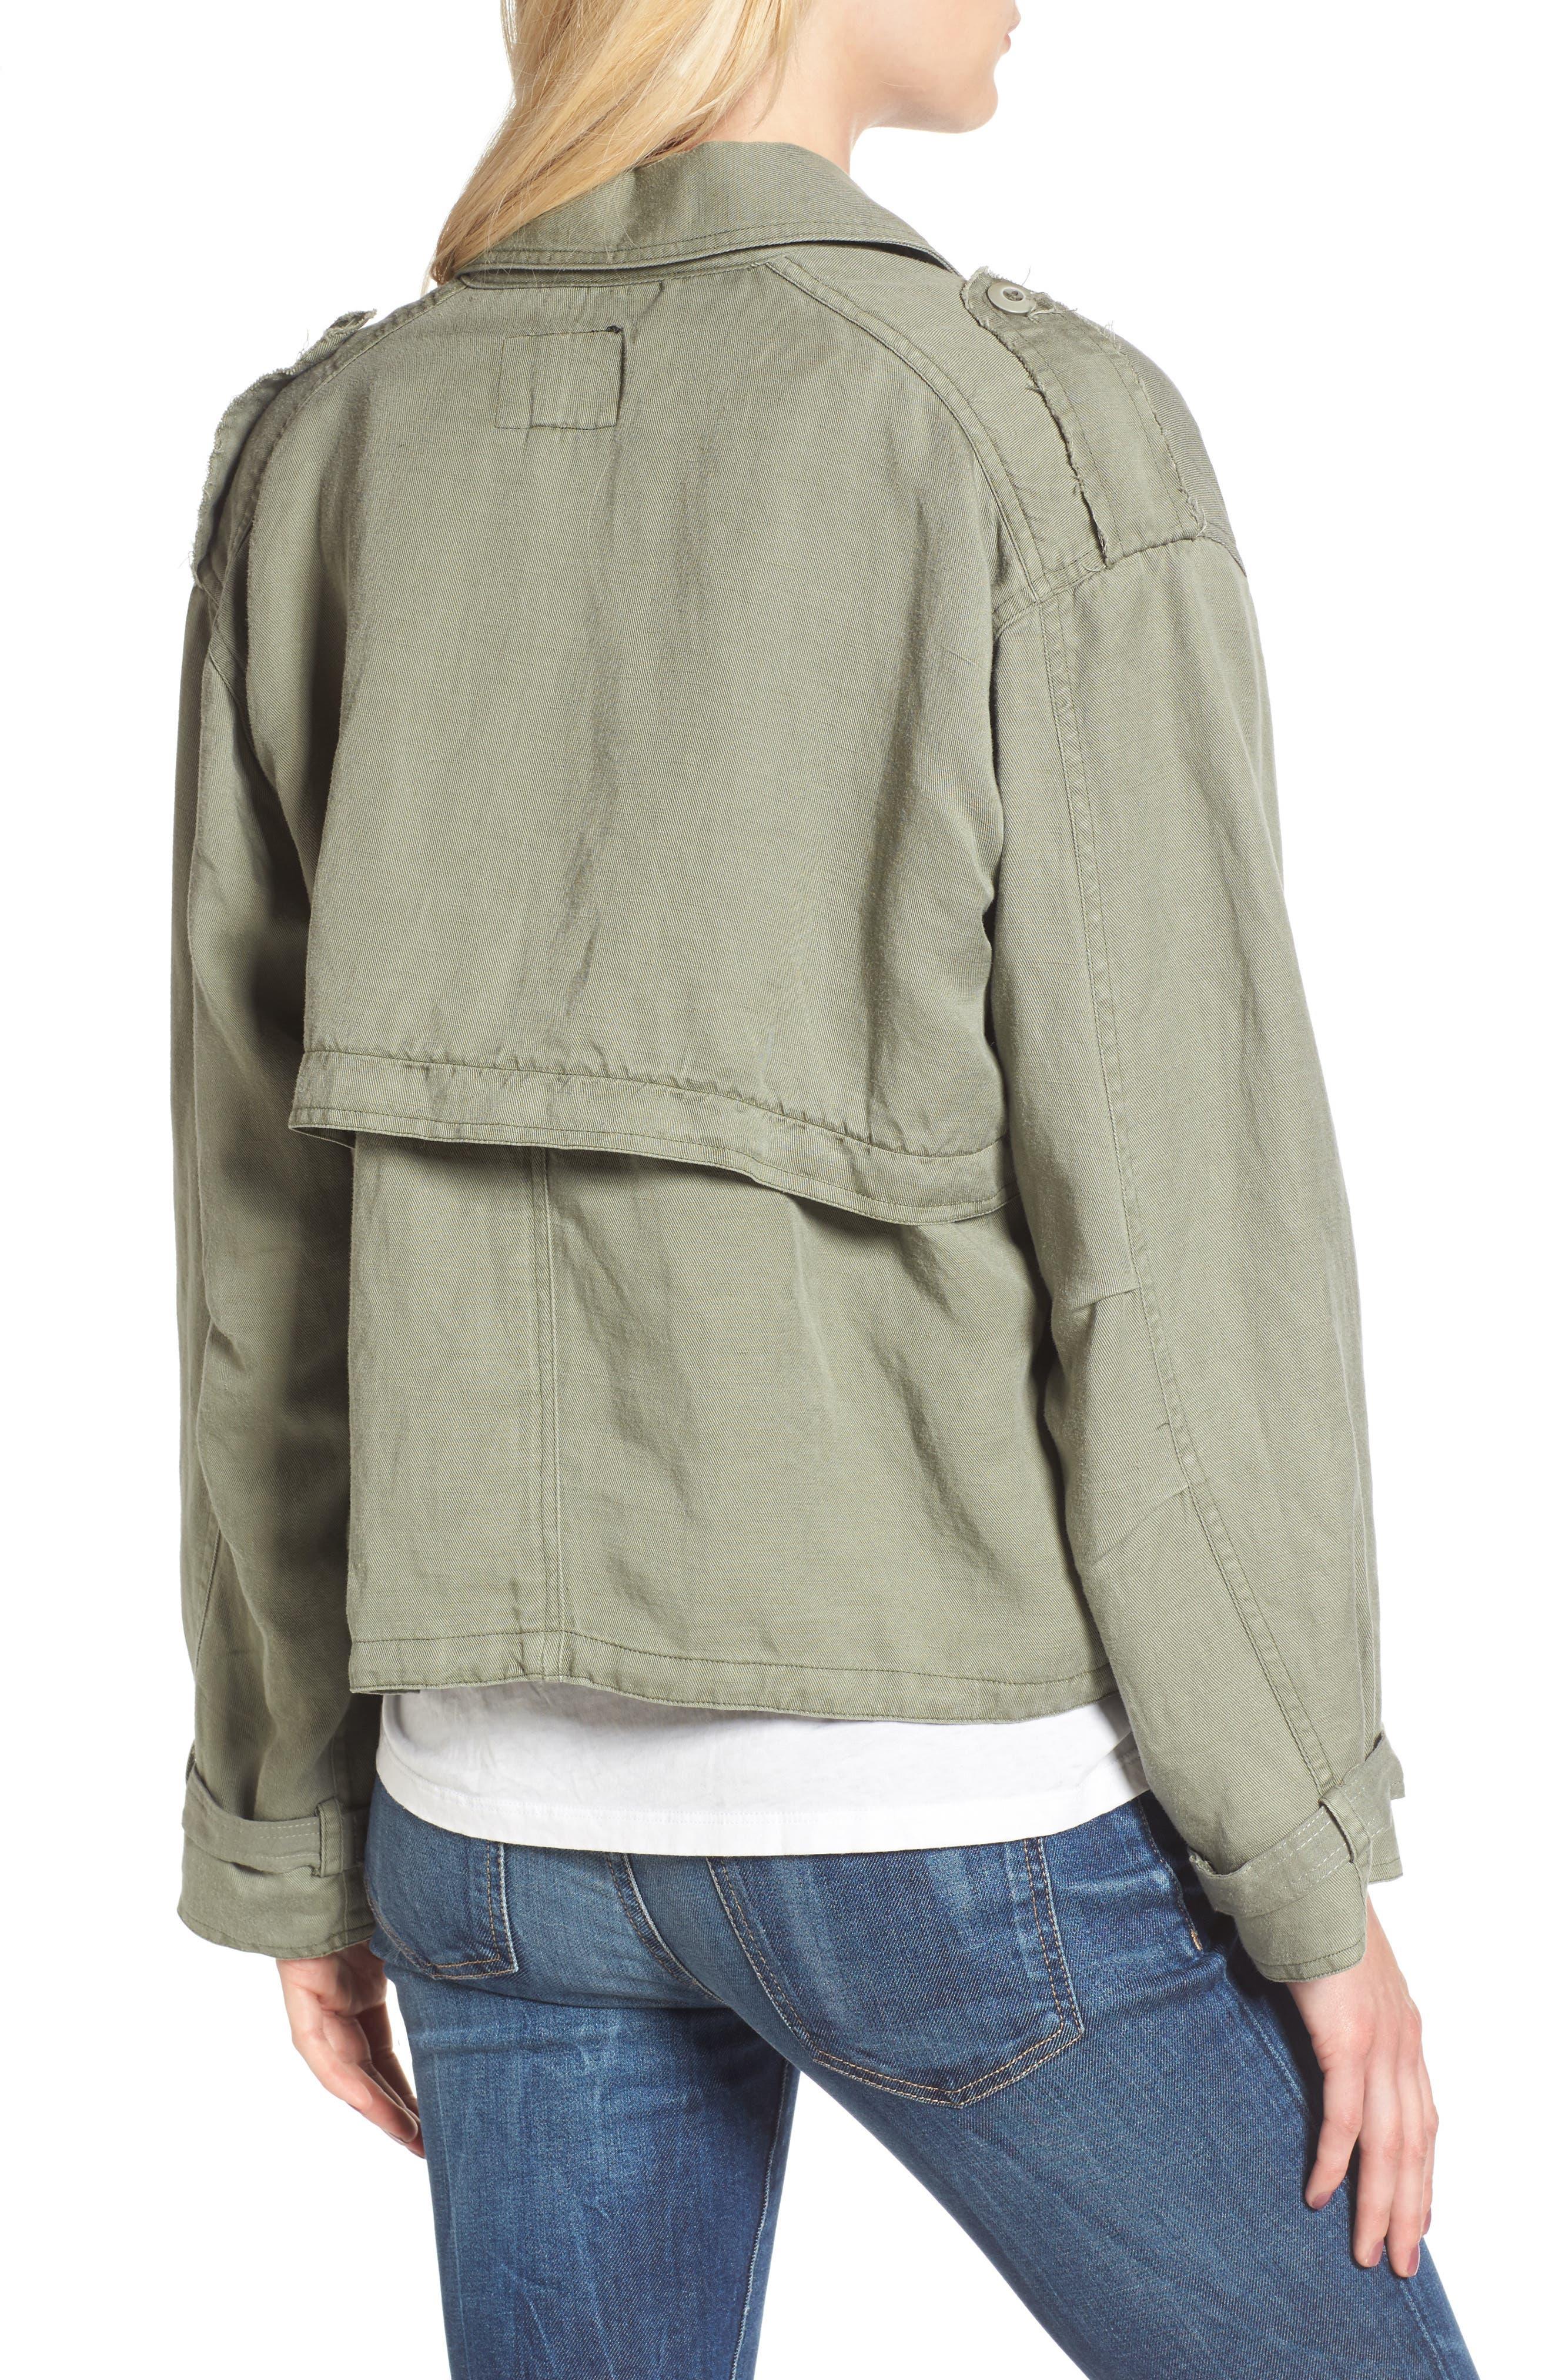 Barclay Crop Jacket,                             Alternate thumbnail 2, color,                             307